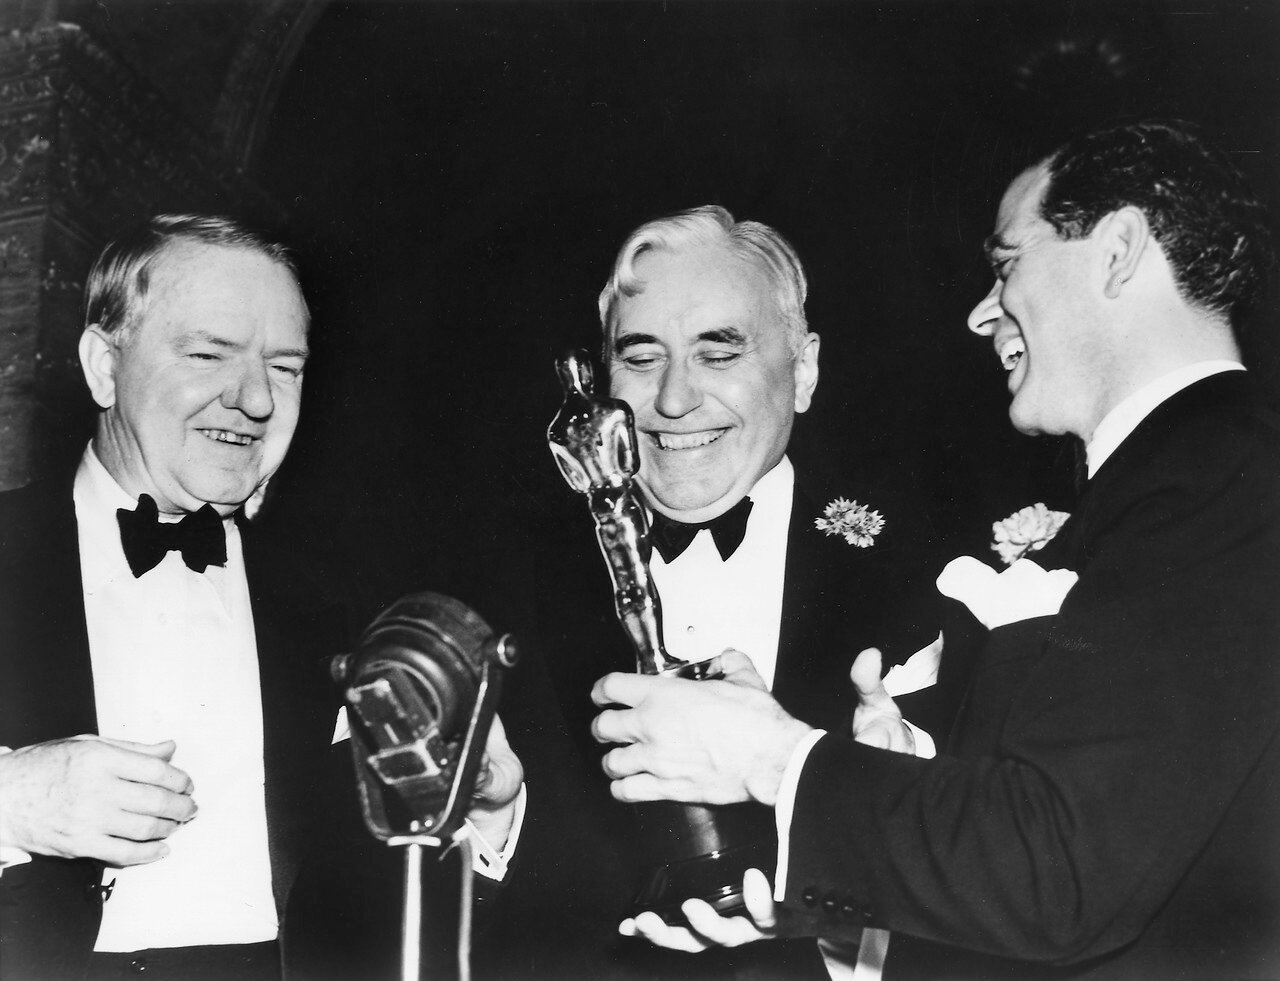 1938. Уильям Клод Филдс, Мак Сеннет (награда за выдающиеся заслуги) и Фрэнк Капра